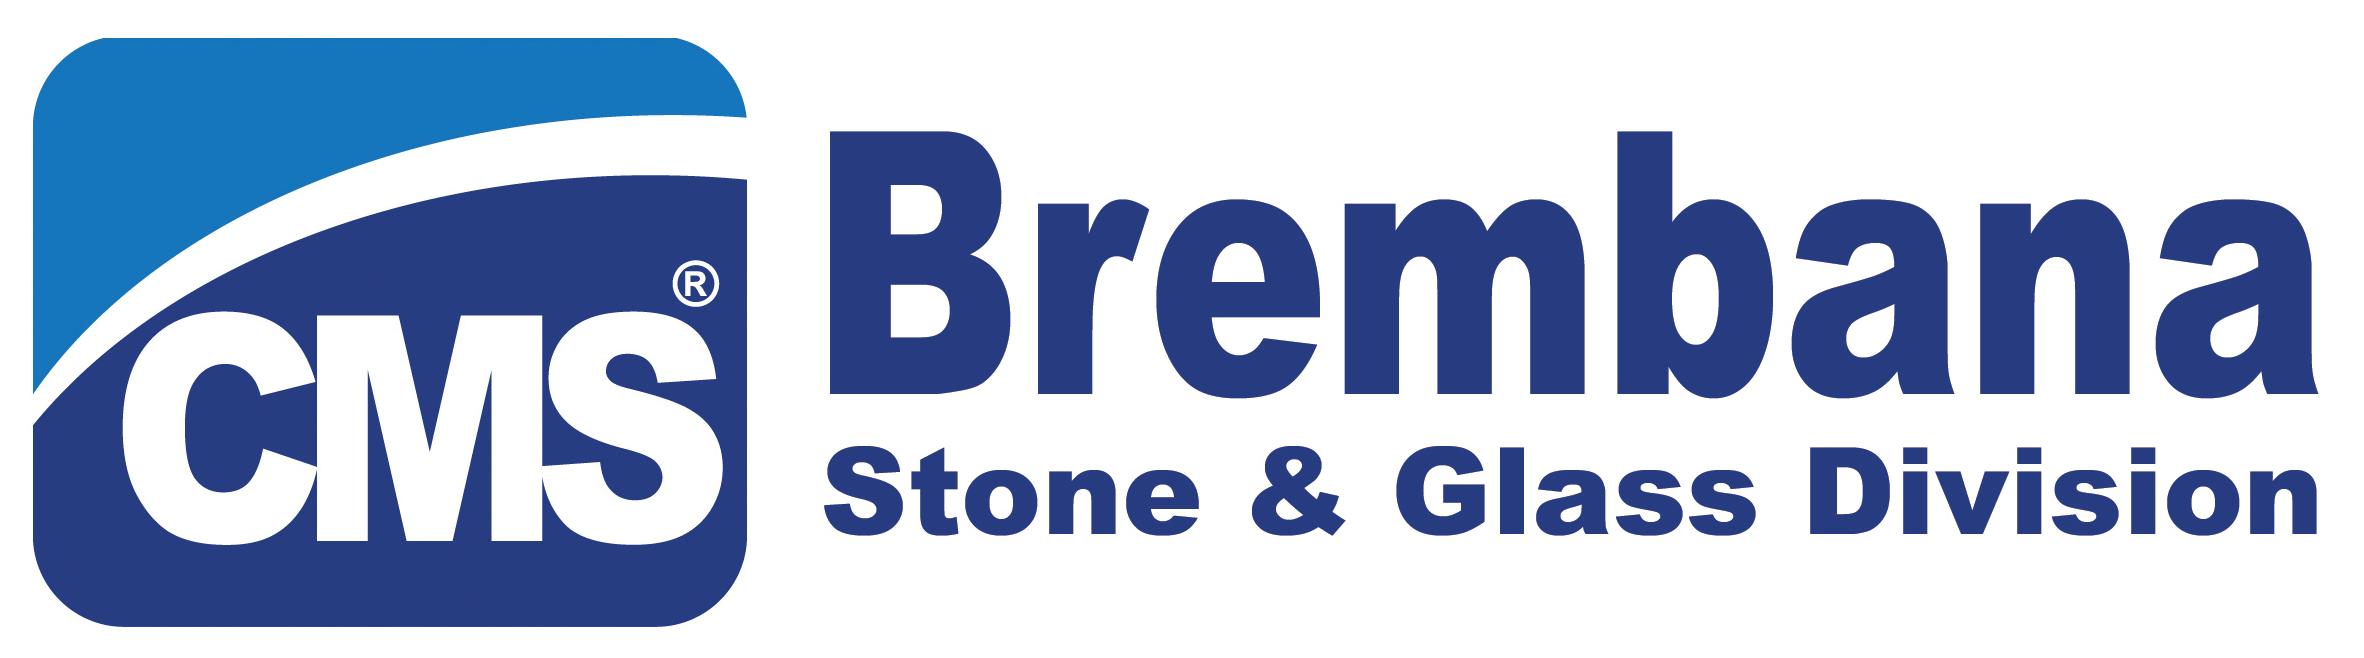 CMS Brembana Stone & Glass Division